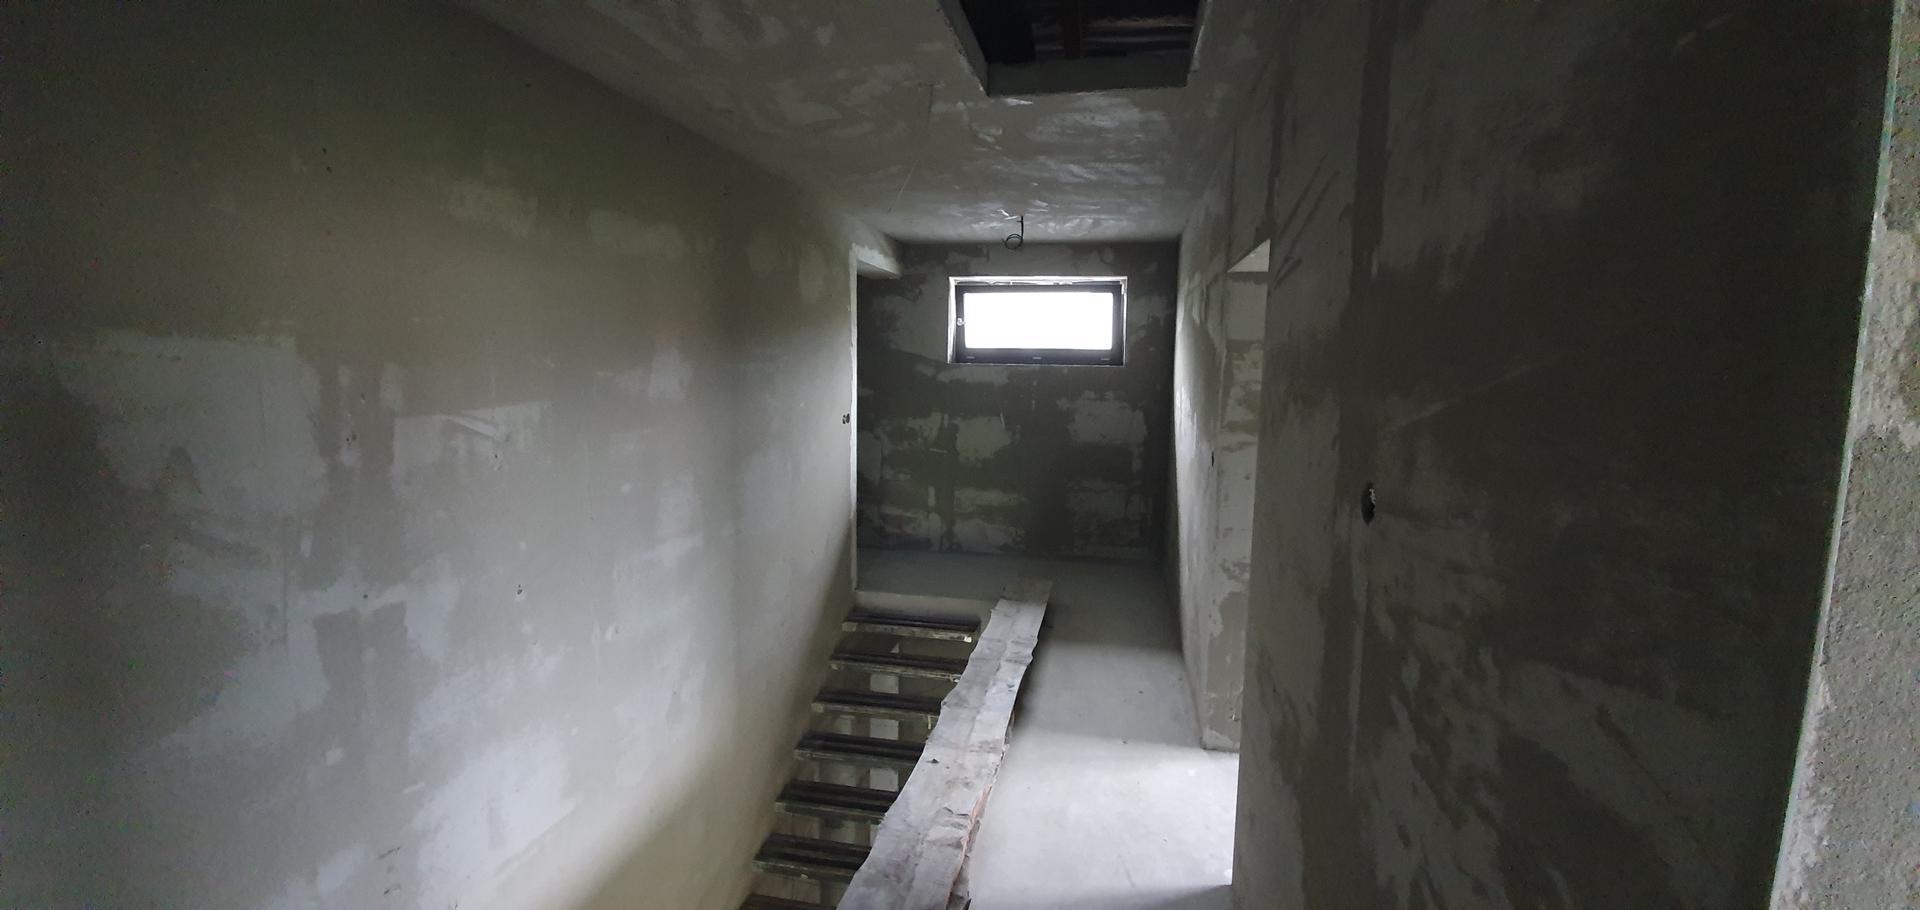 Konzolove schodisko (samonosne schody) - Omietka nahrubo